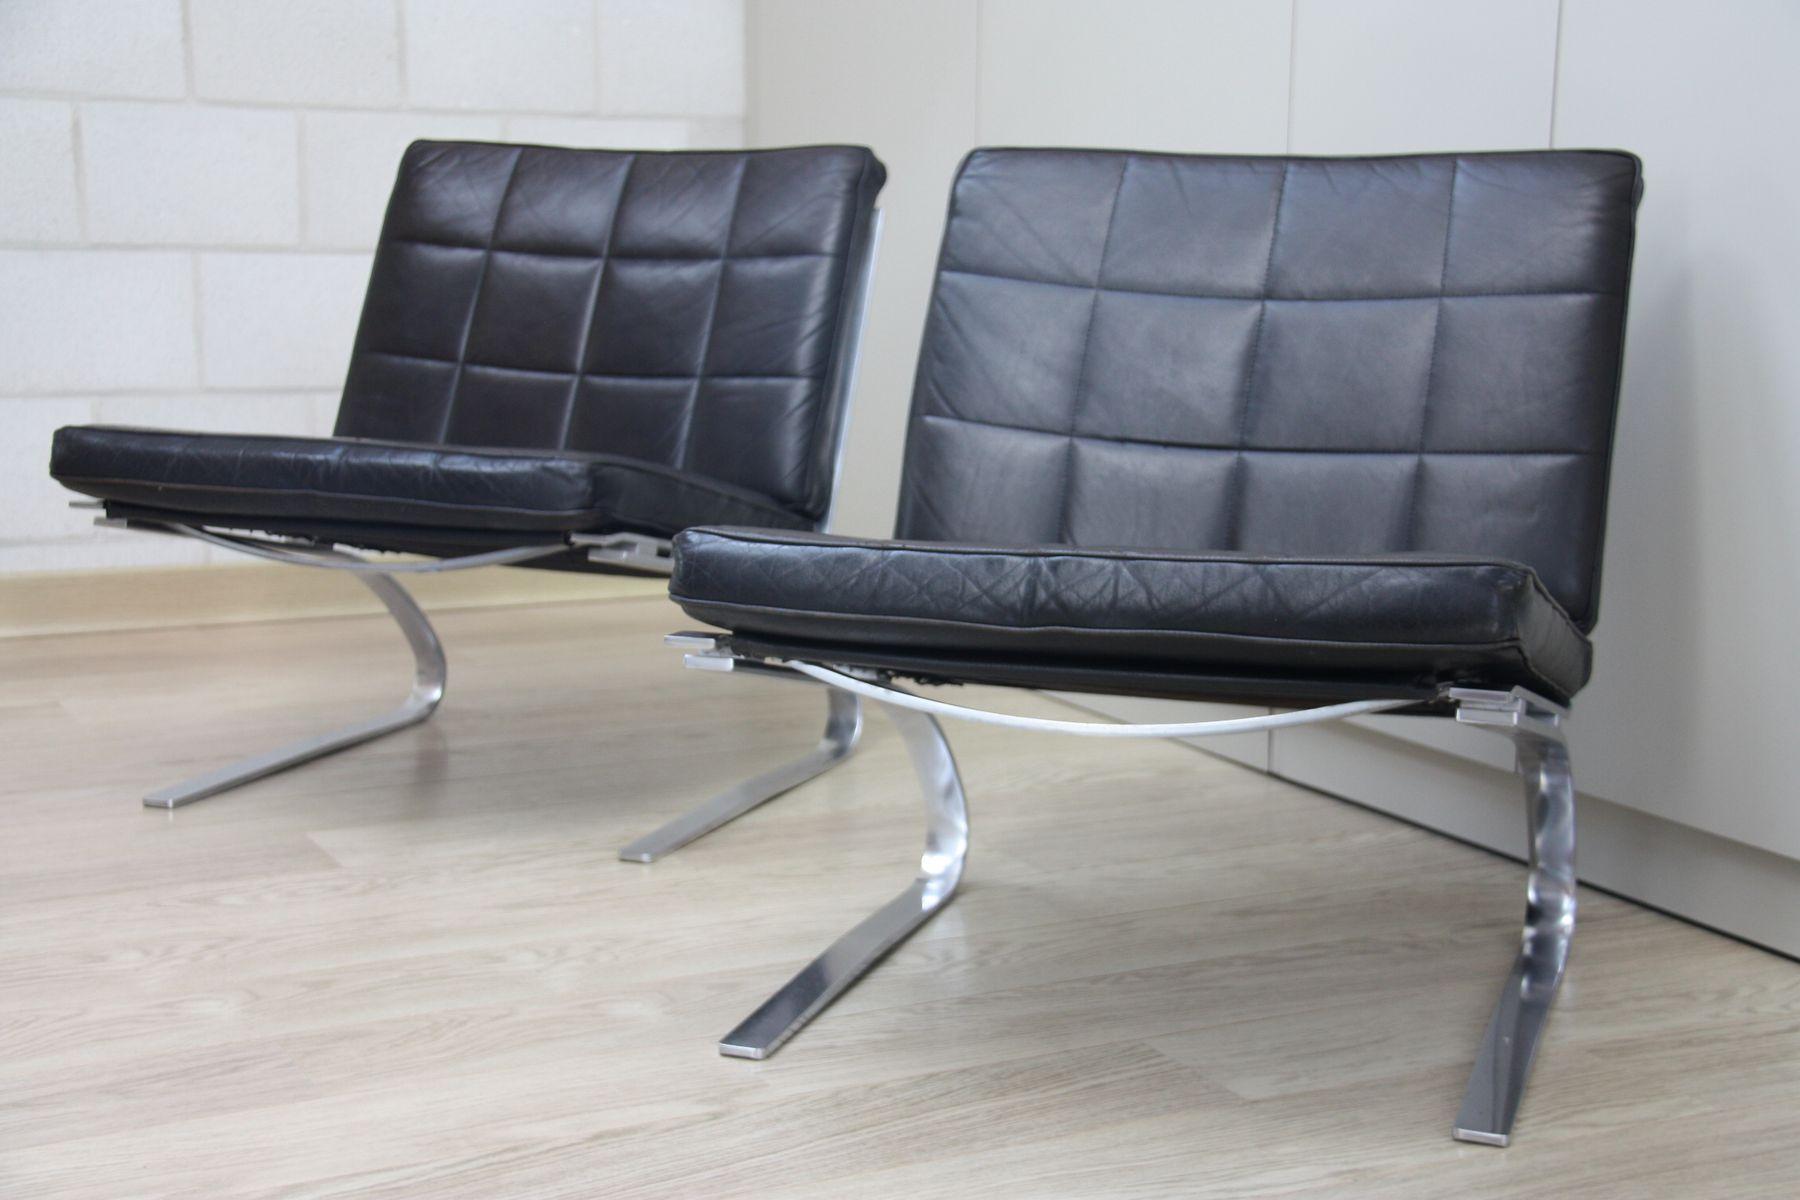 schwarze vintage leder swing st hle von hans eichenberger f r girsberger 2er set bei pamono kaufen. Black Bedroom Furniture Sets. Home Design Ideas